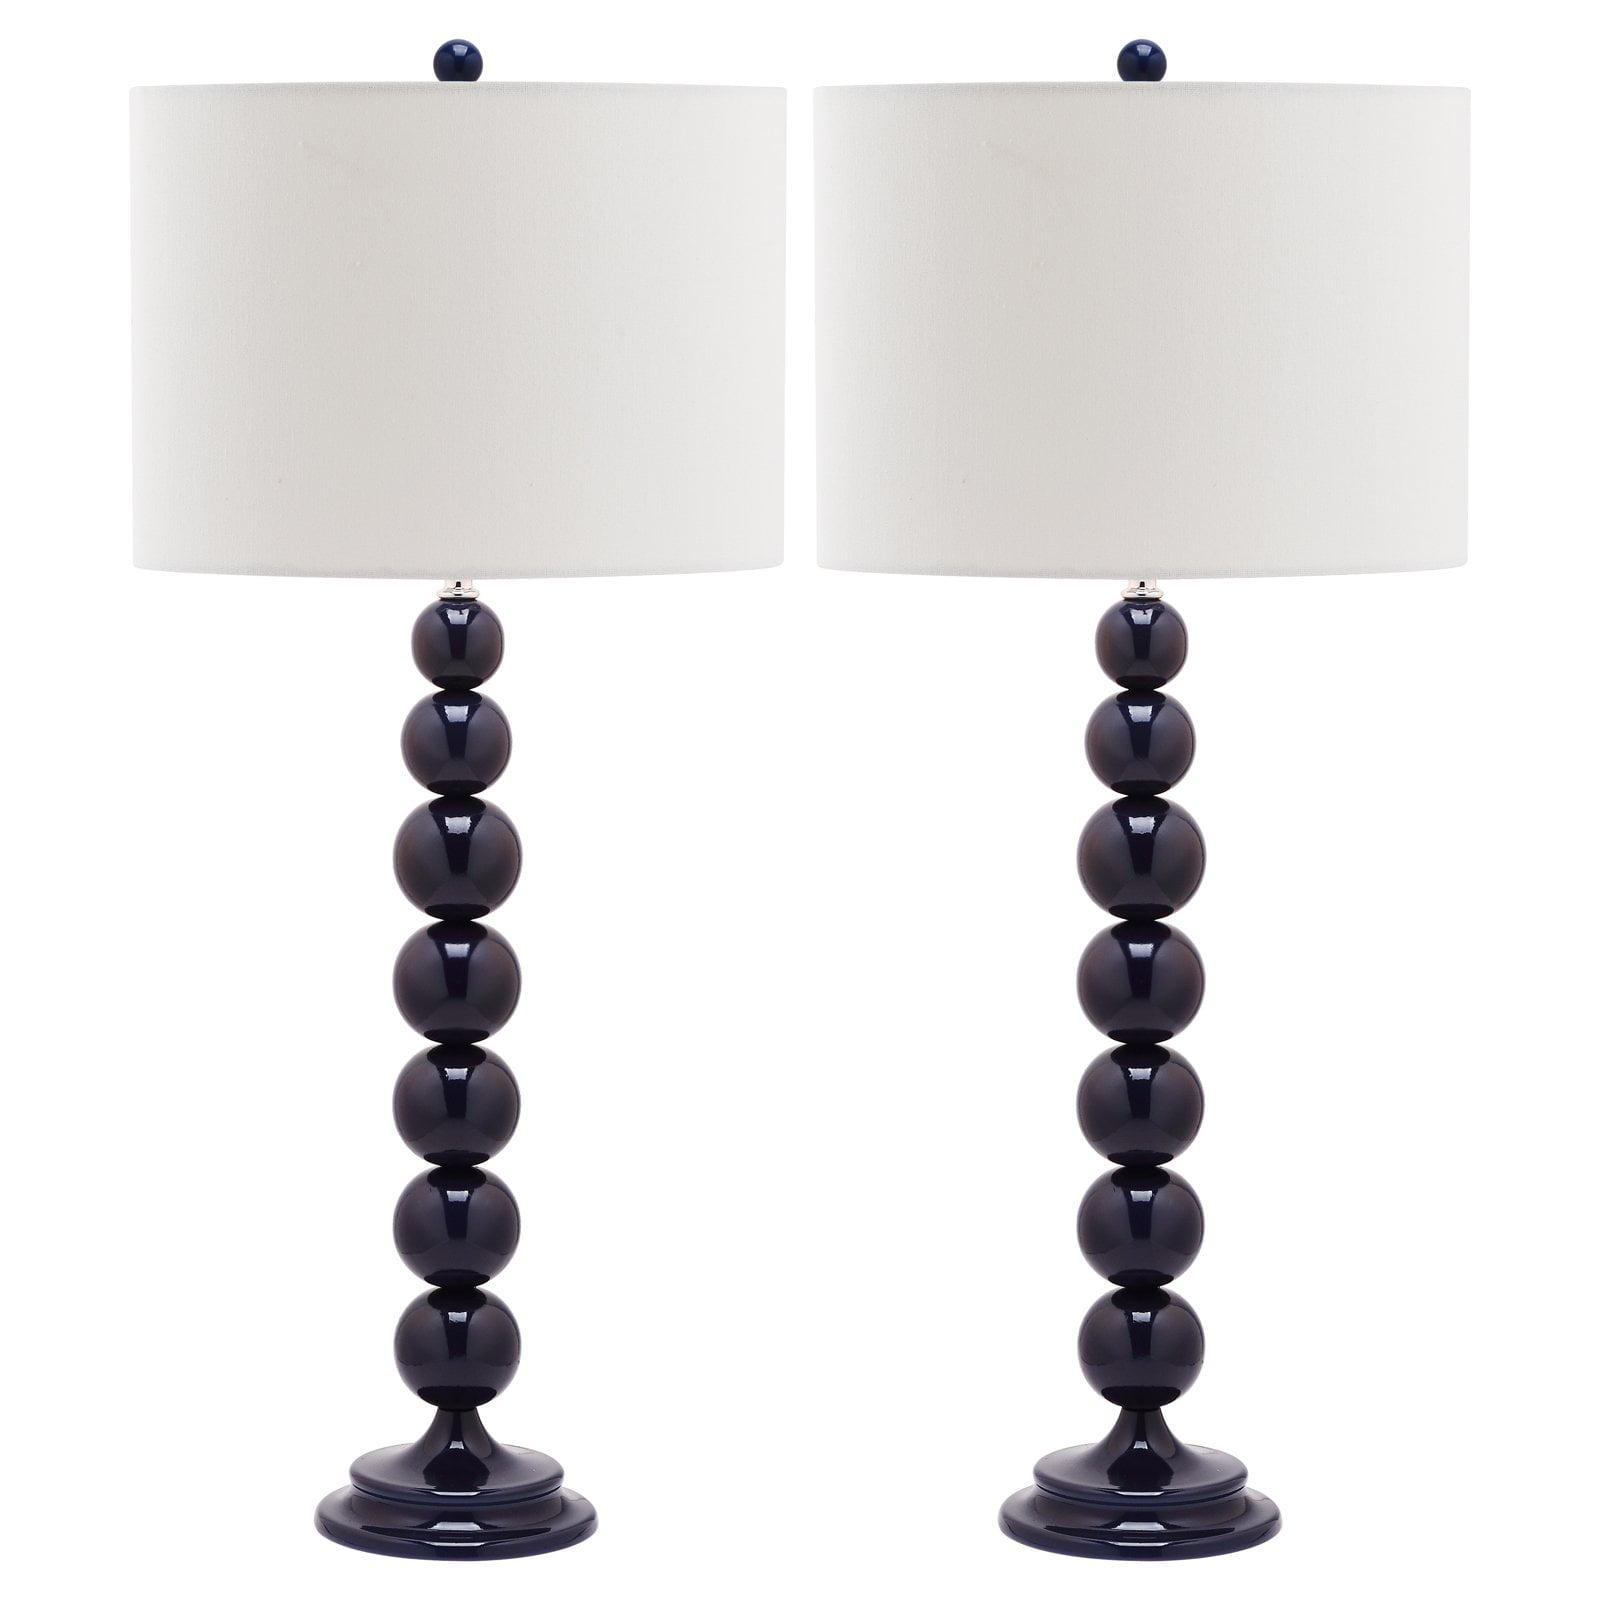 Safavieh Jenna LIT4090 Stacked Ball Table Lamp - Set of 2